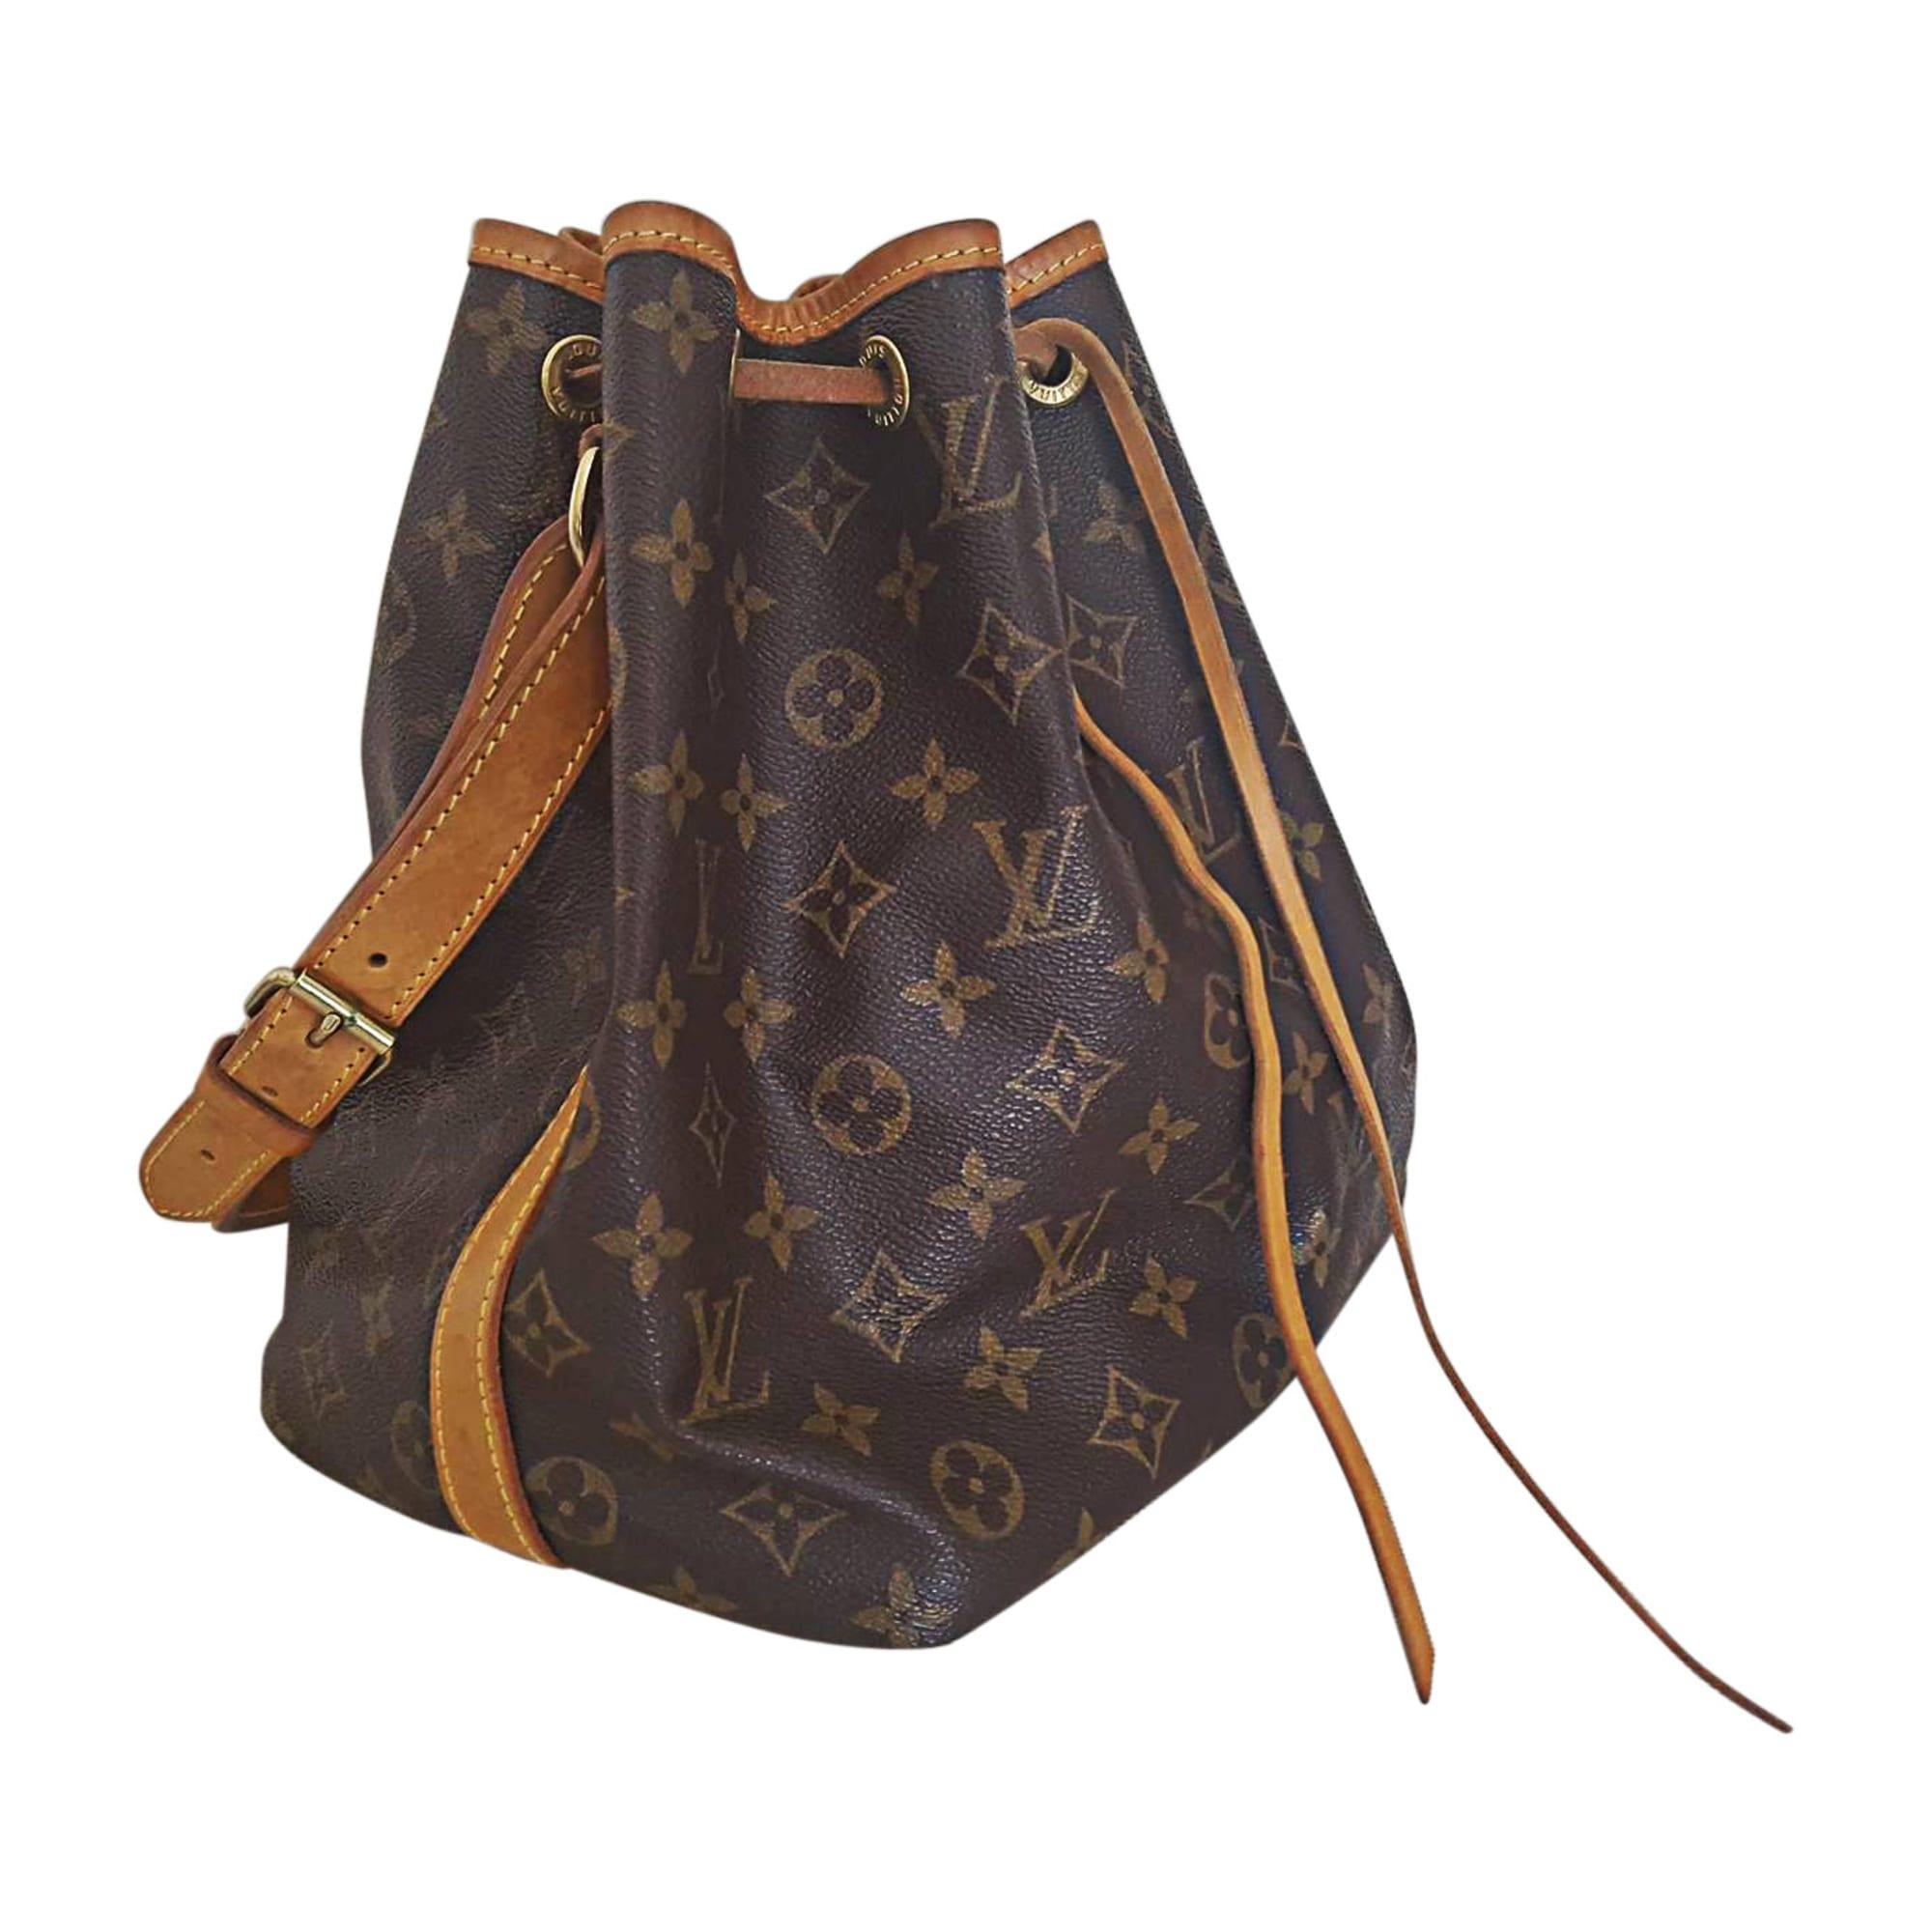 fcb60b0105 Sac à main en cuir LOUIS VUITTON no marron vendu par Bestbags - 6488389